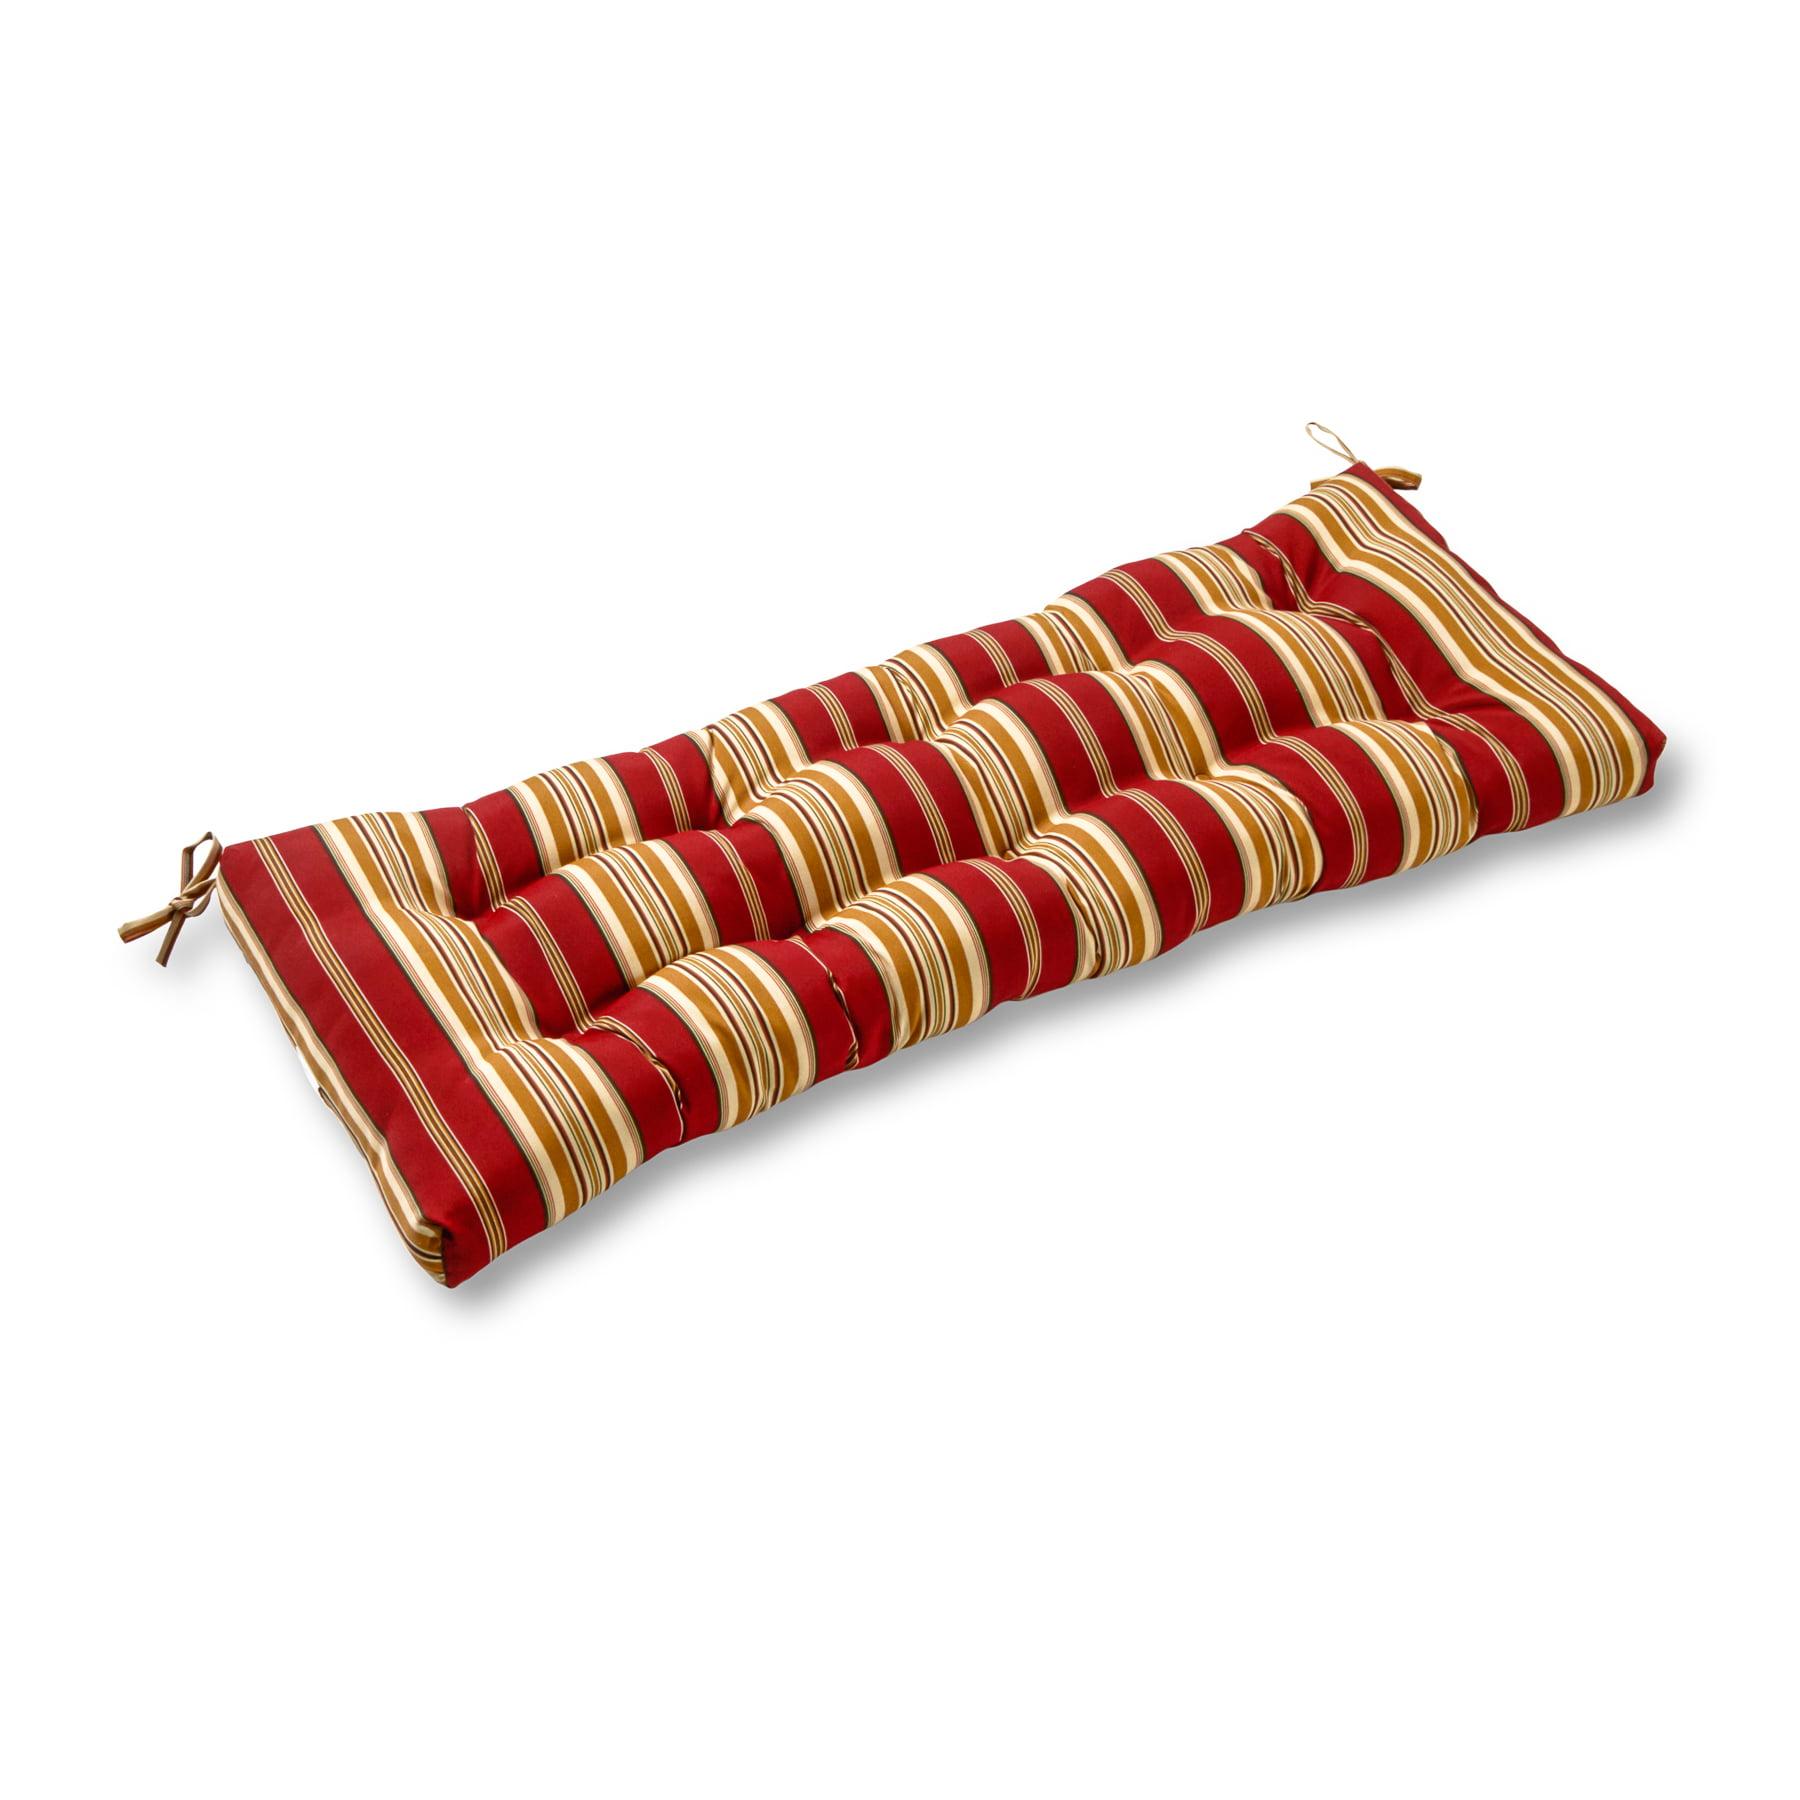 Roma Stripe 44 x 17 in. Outdoor Swing/Bench Cushion